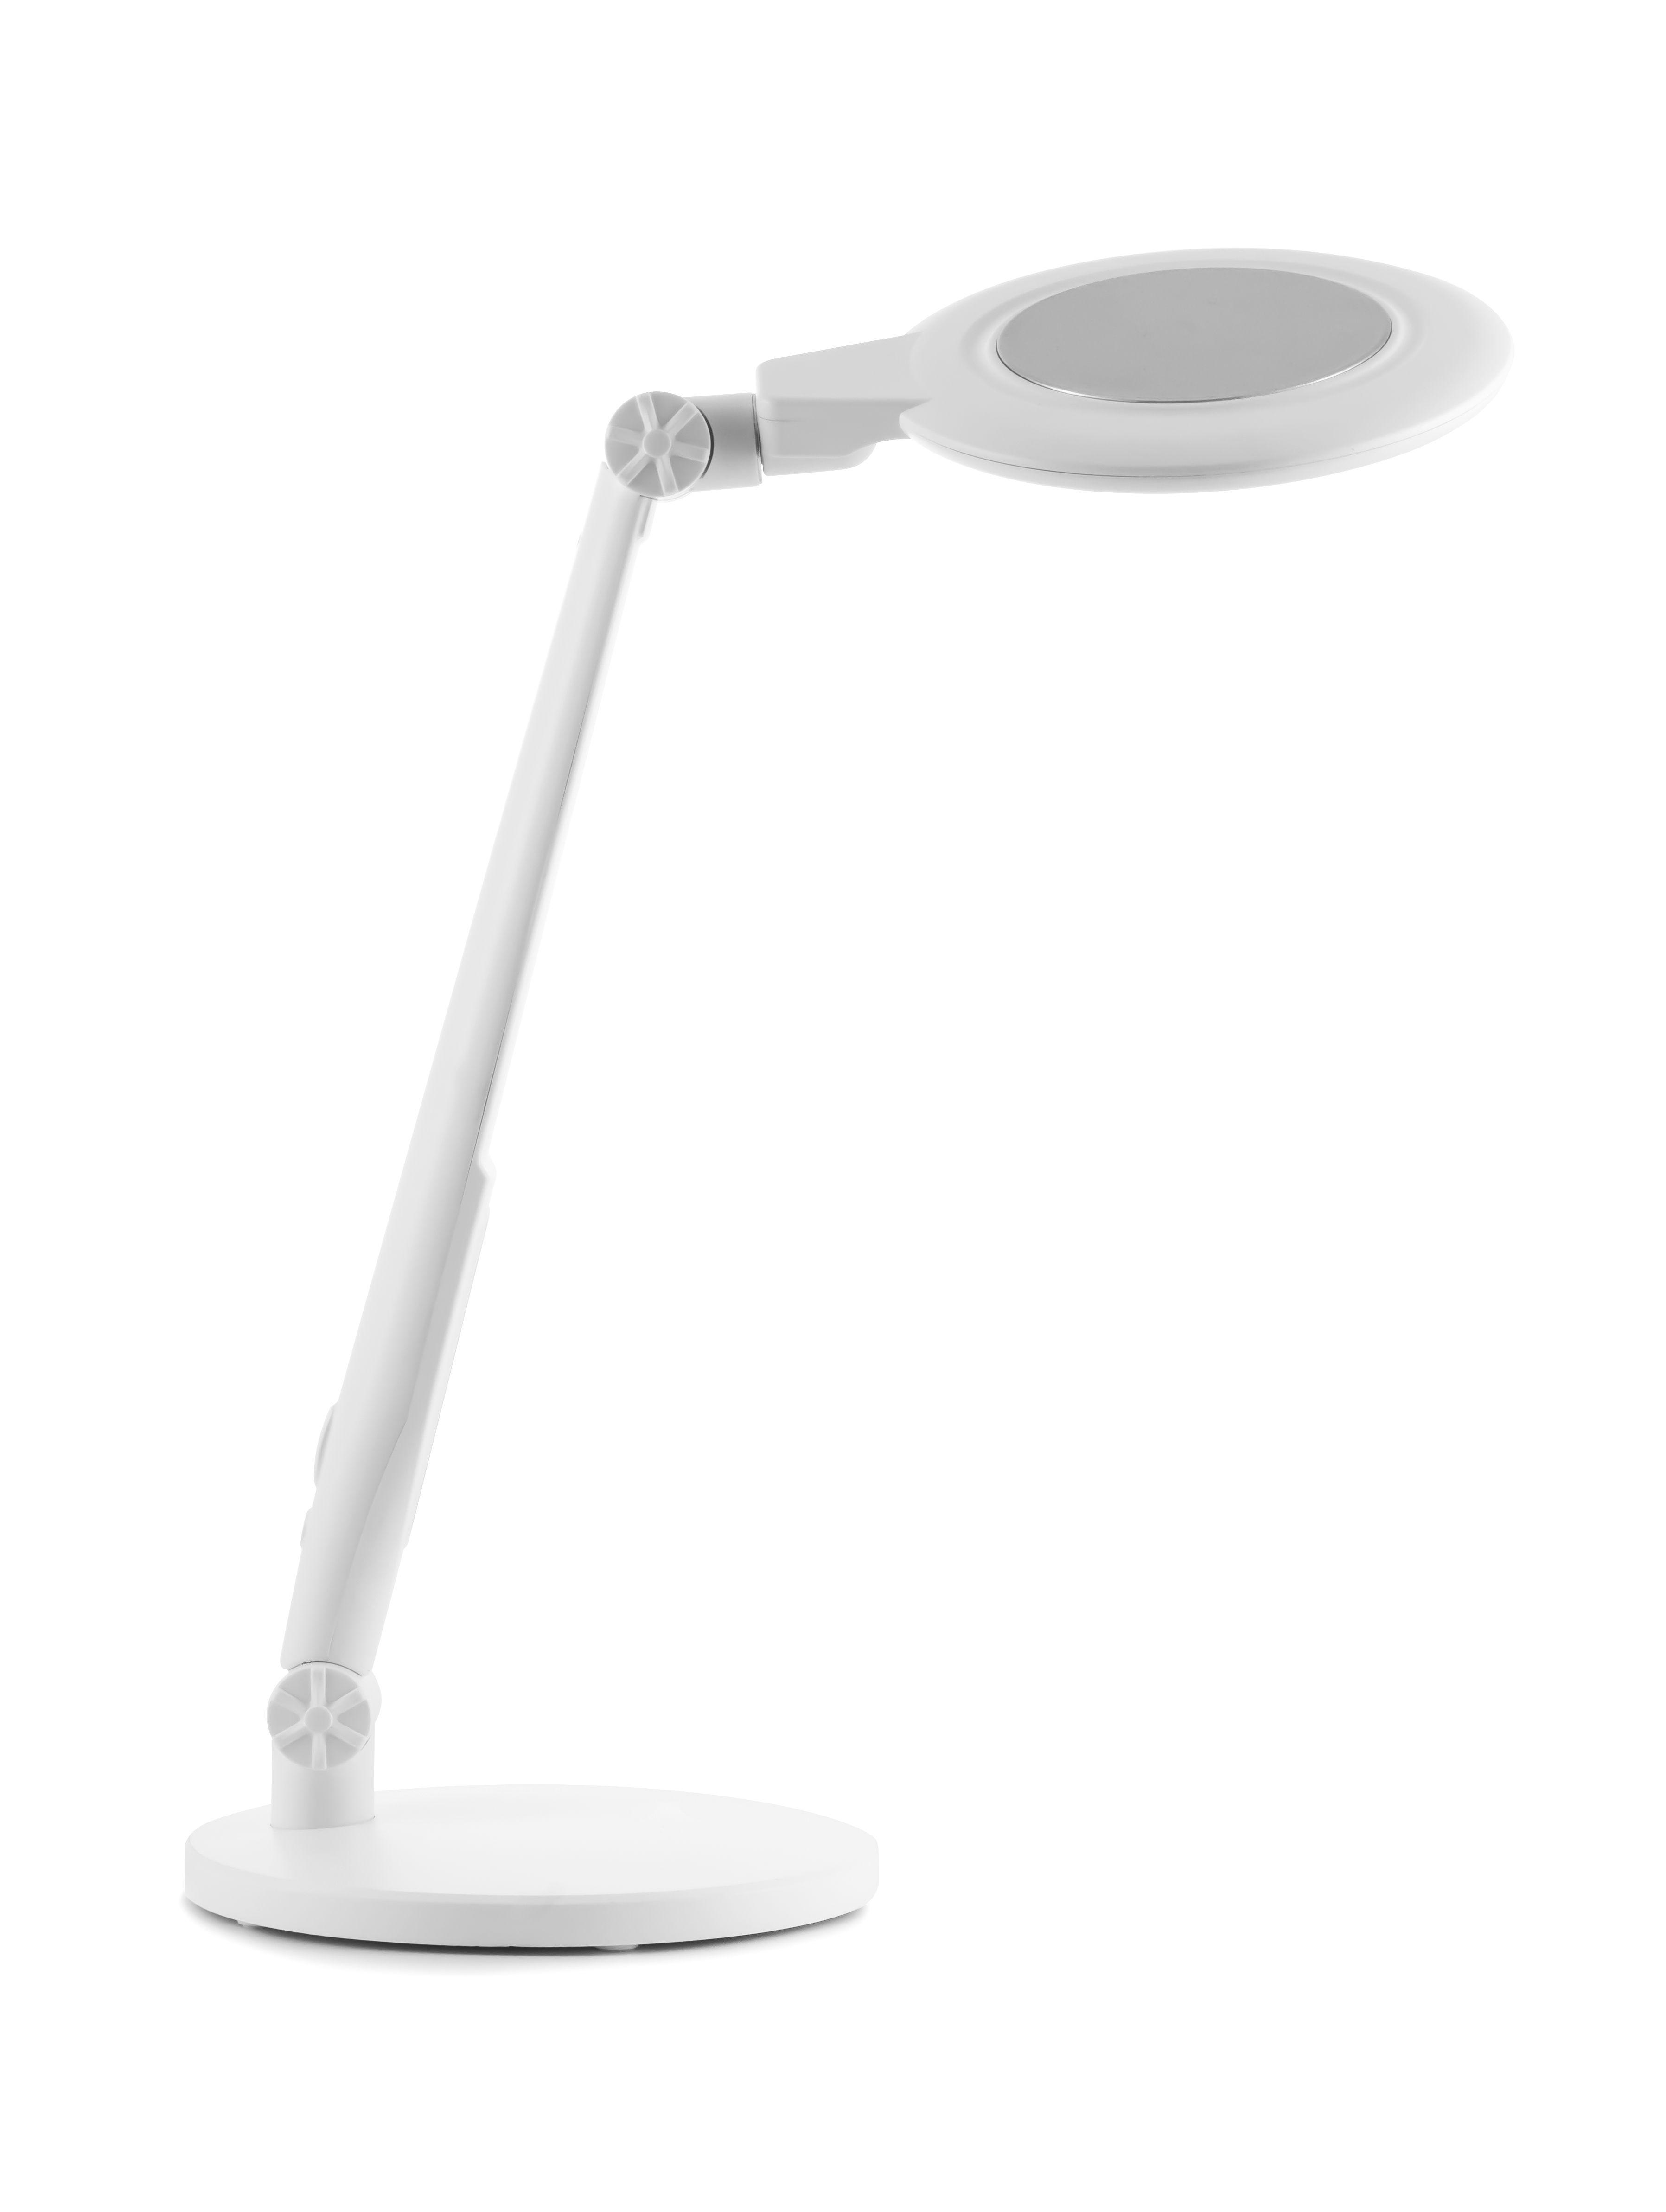 Led Table Lamp Eye Protect Aa Level Light Sunlike Led Like Sun